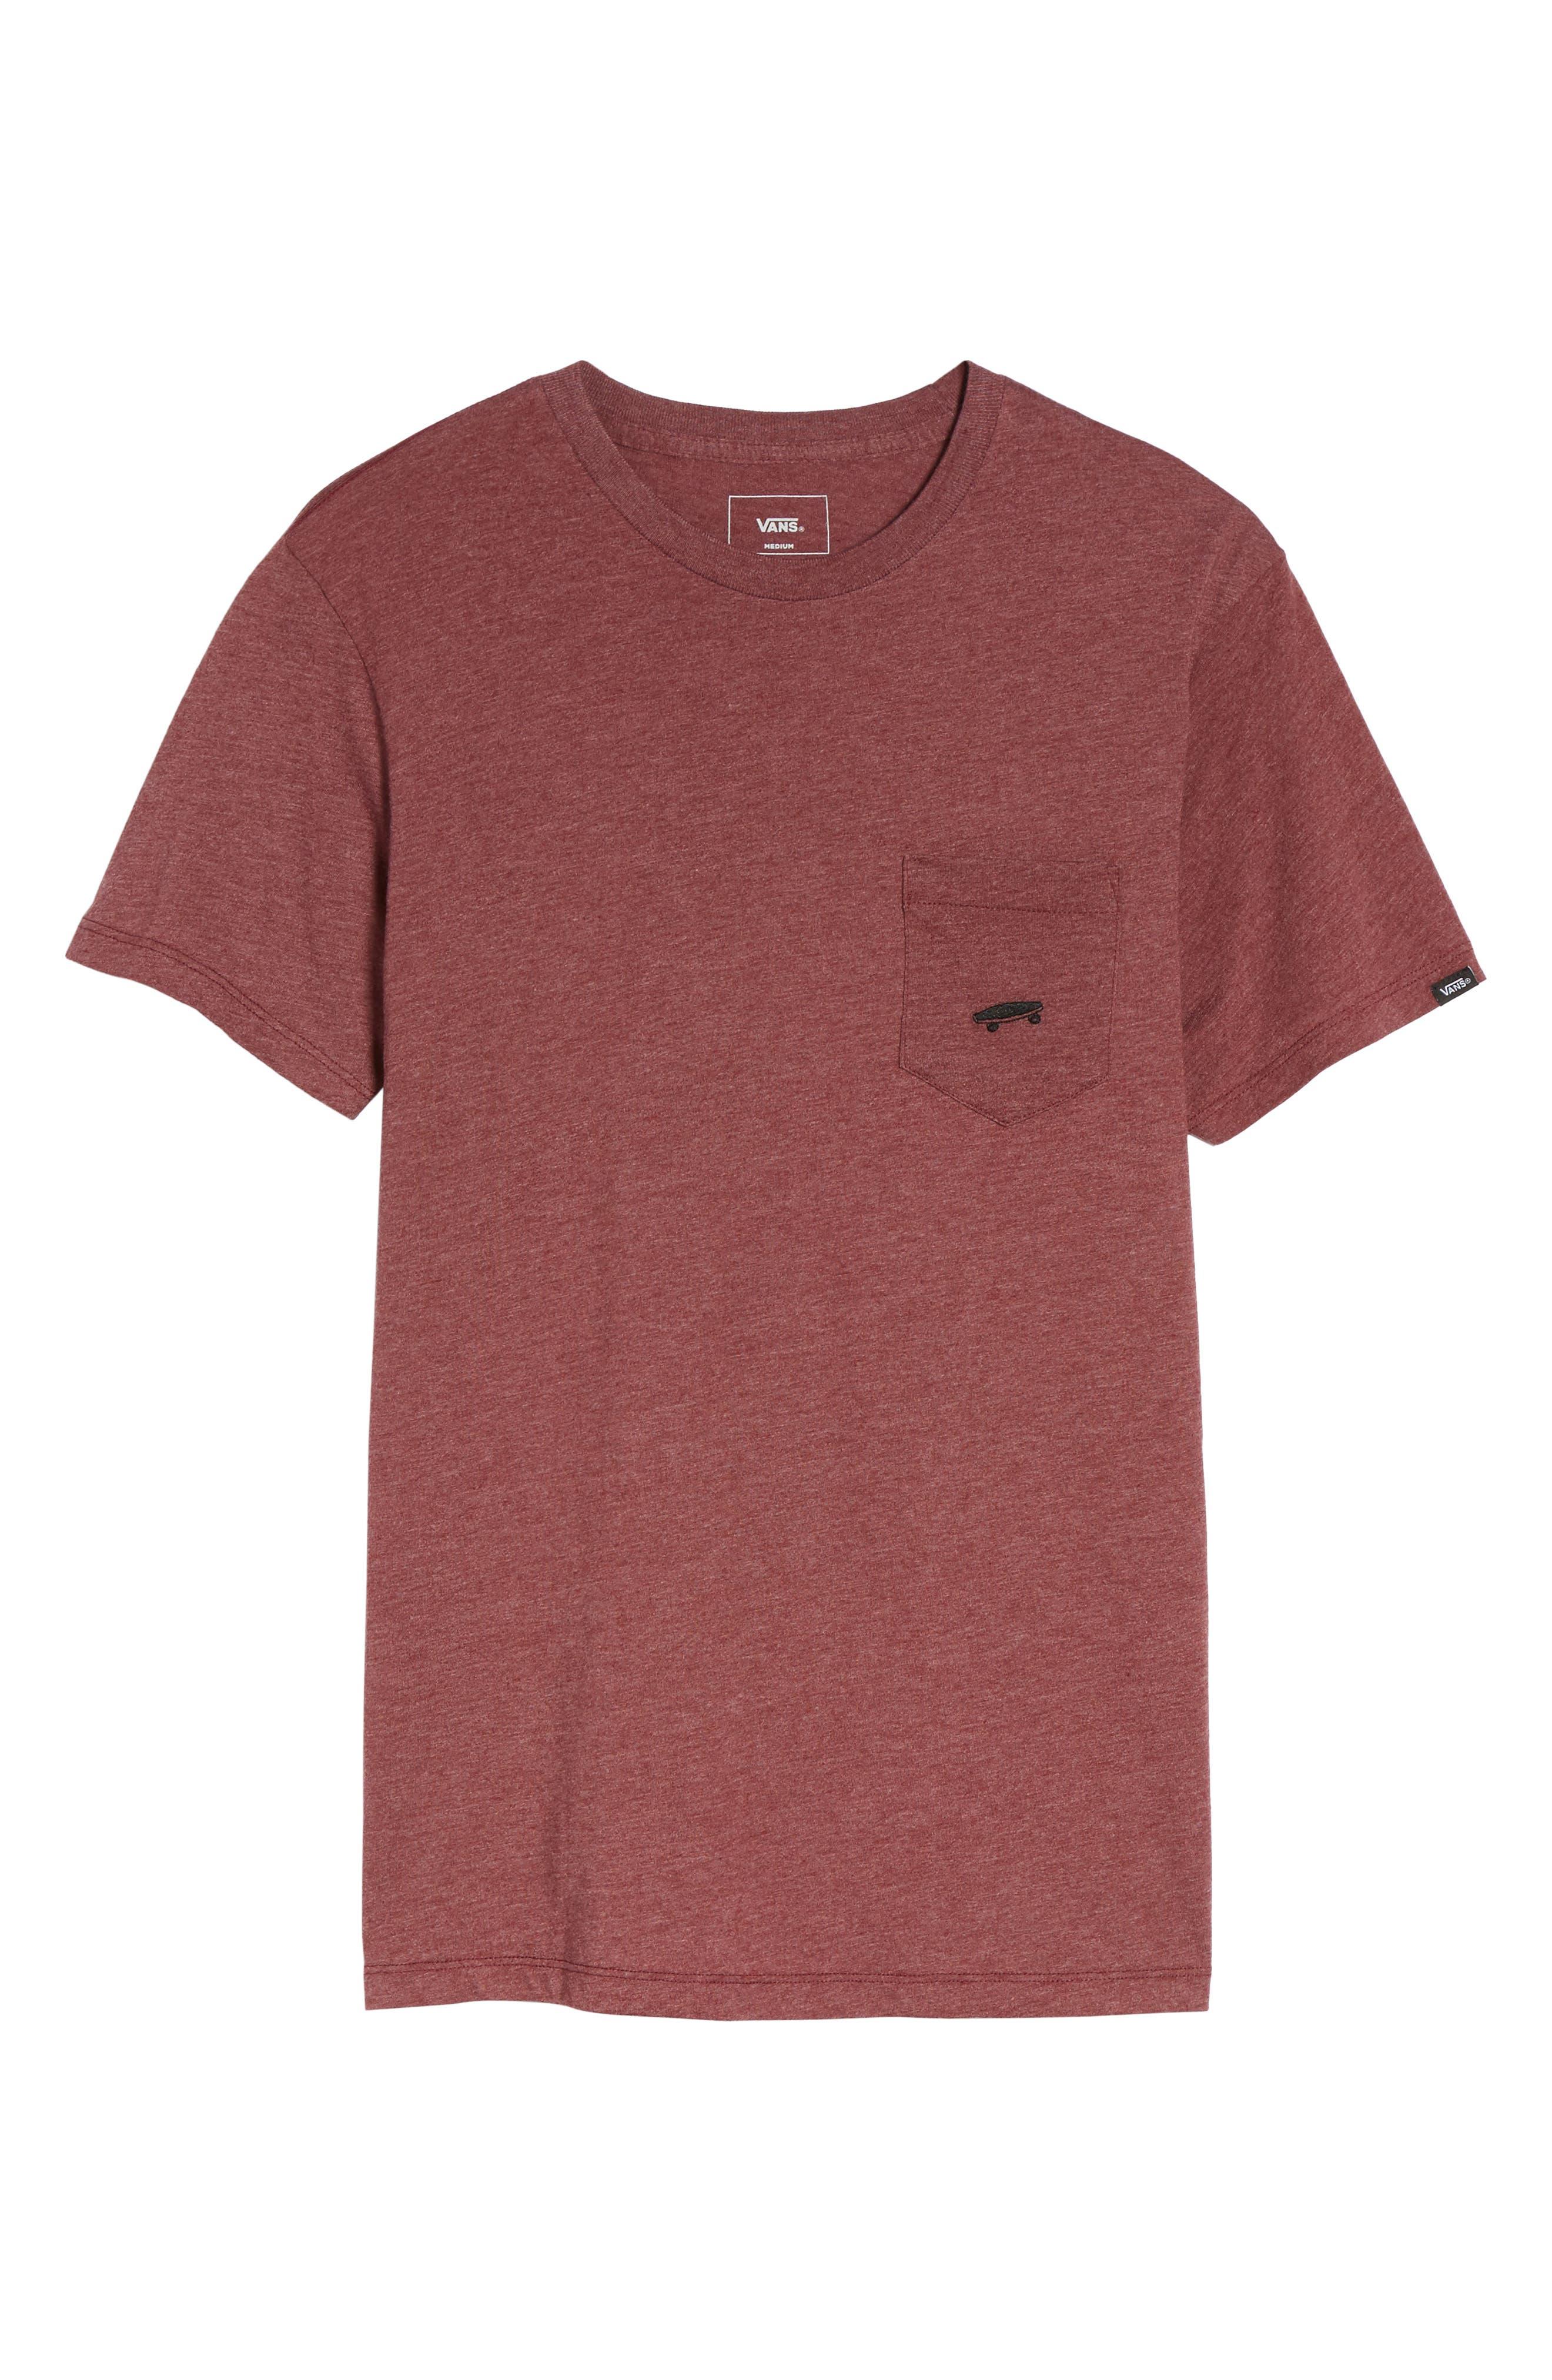 Main Image - Vans Everyday Embroidered Pocket T-Shirt